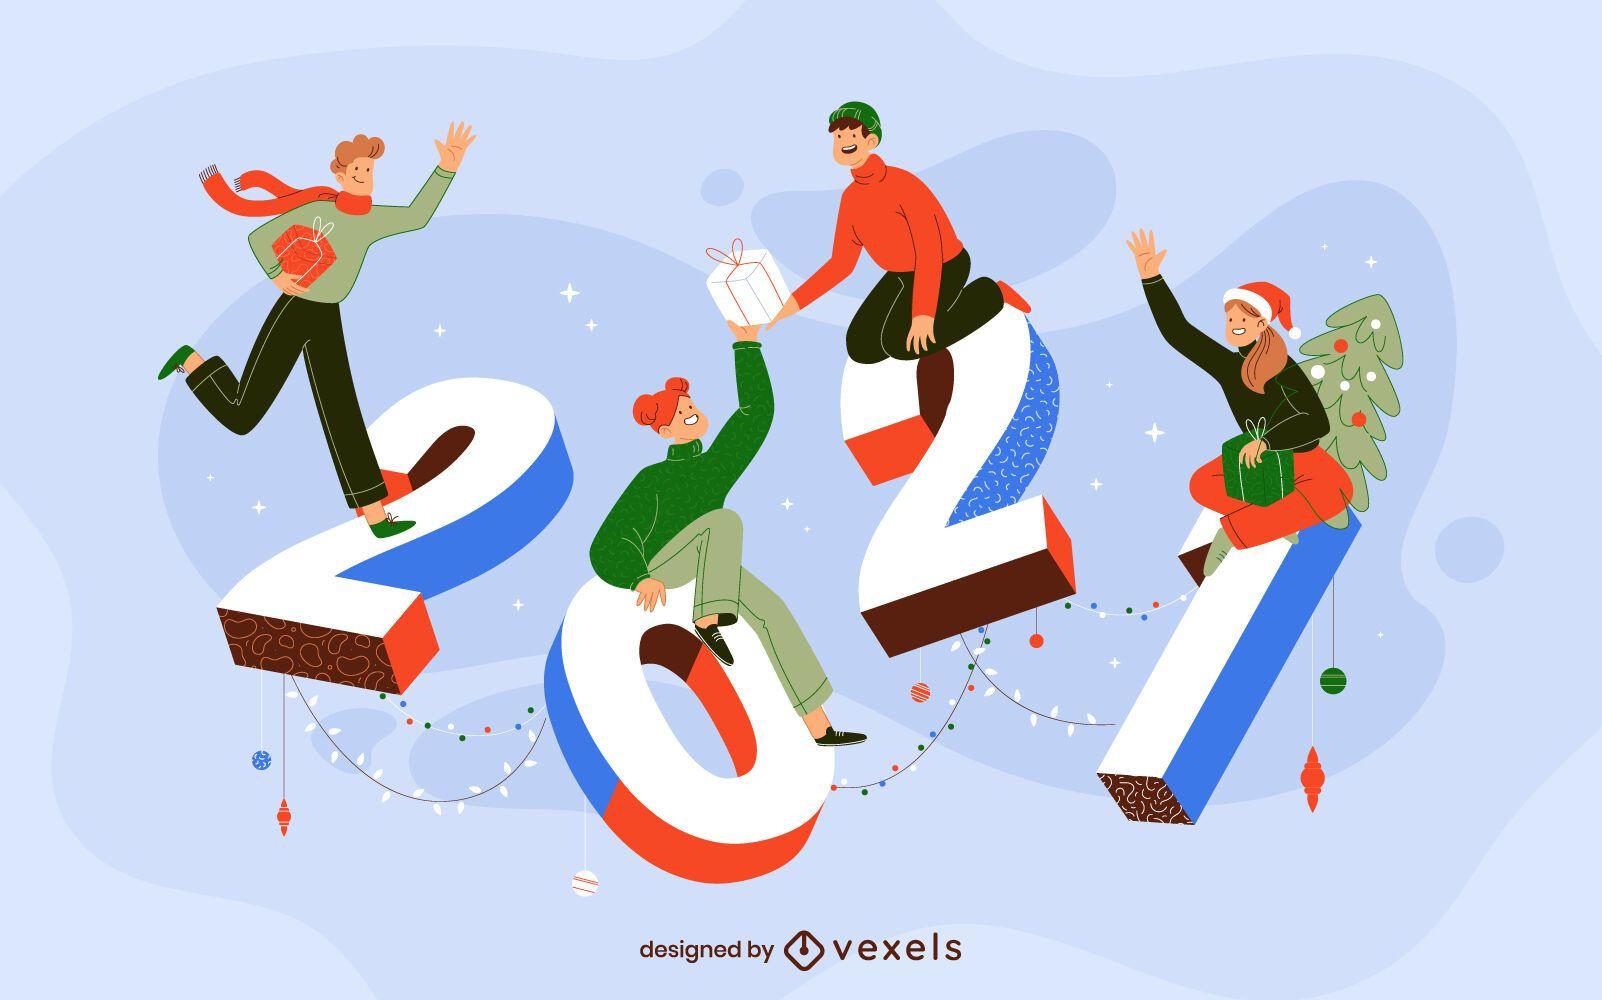 2021 celebration characters illustration design